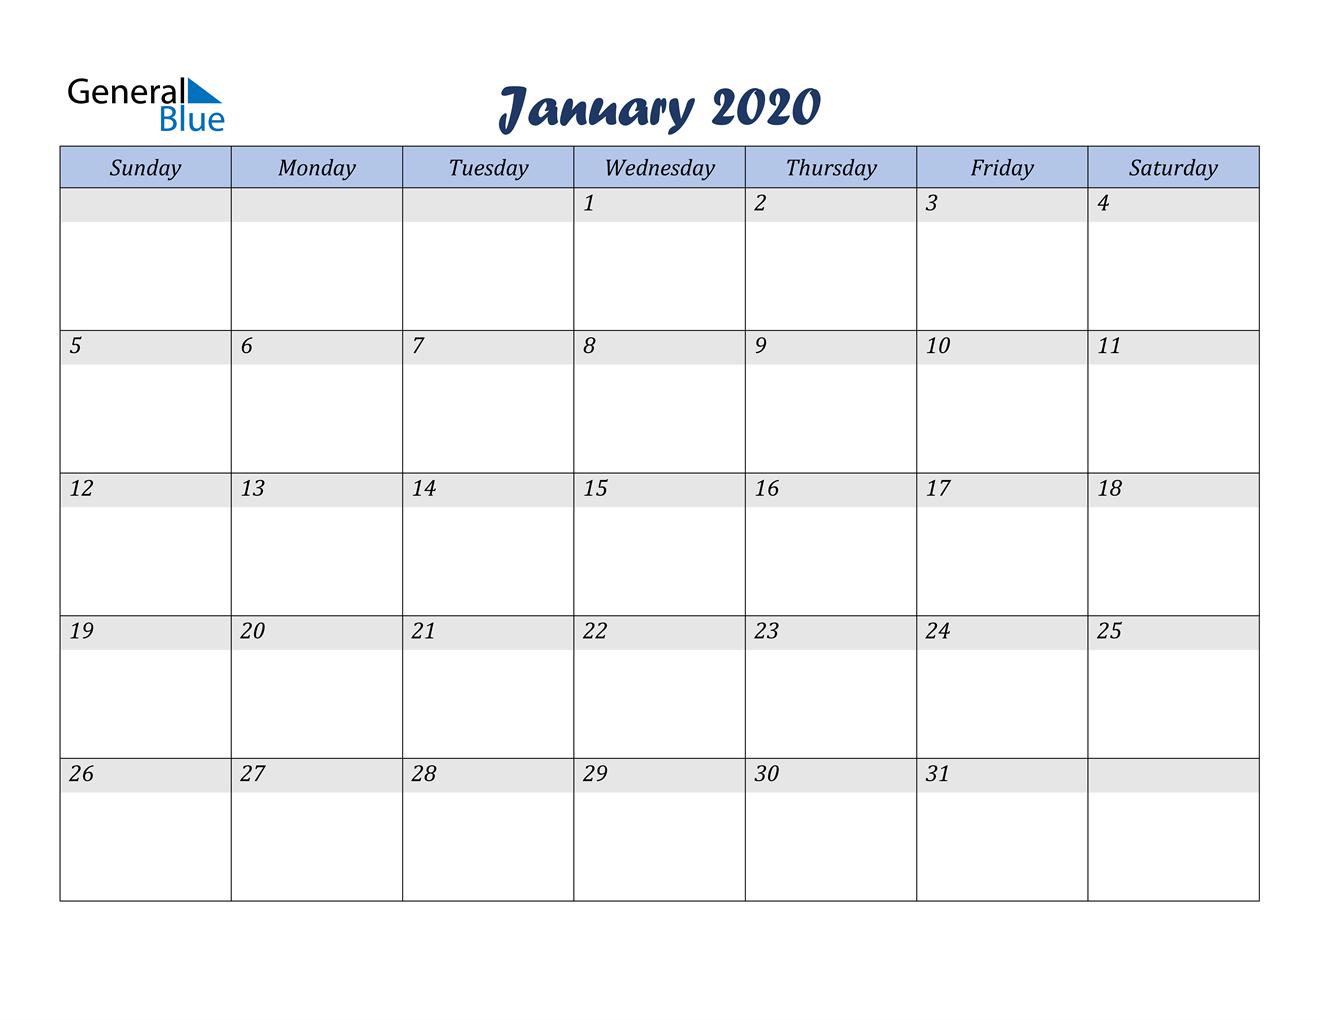 January 2020 Calendar - Pdf Word Excel with regard to 2020 Etited Calendar